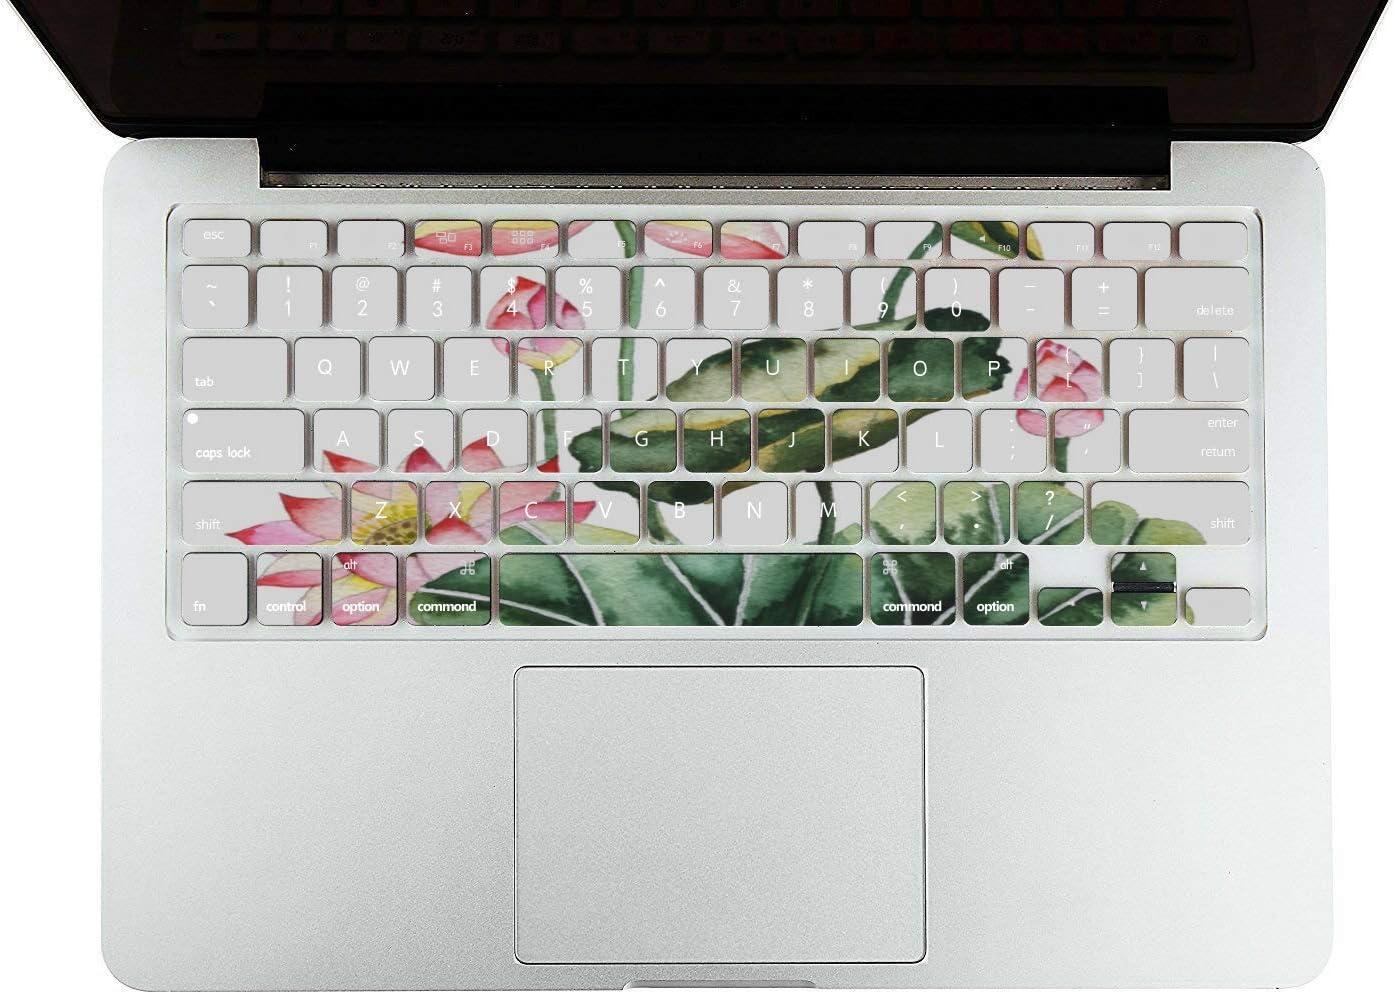 MacBook Pro 2015 Case Summer Hangzhou Western Lake Lotus Plastic Hard Shell Compatible Mac Air 11 Pro 13 15 2018 MacBook Pro Case Protection for MacBook 2016-2019 Version